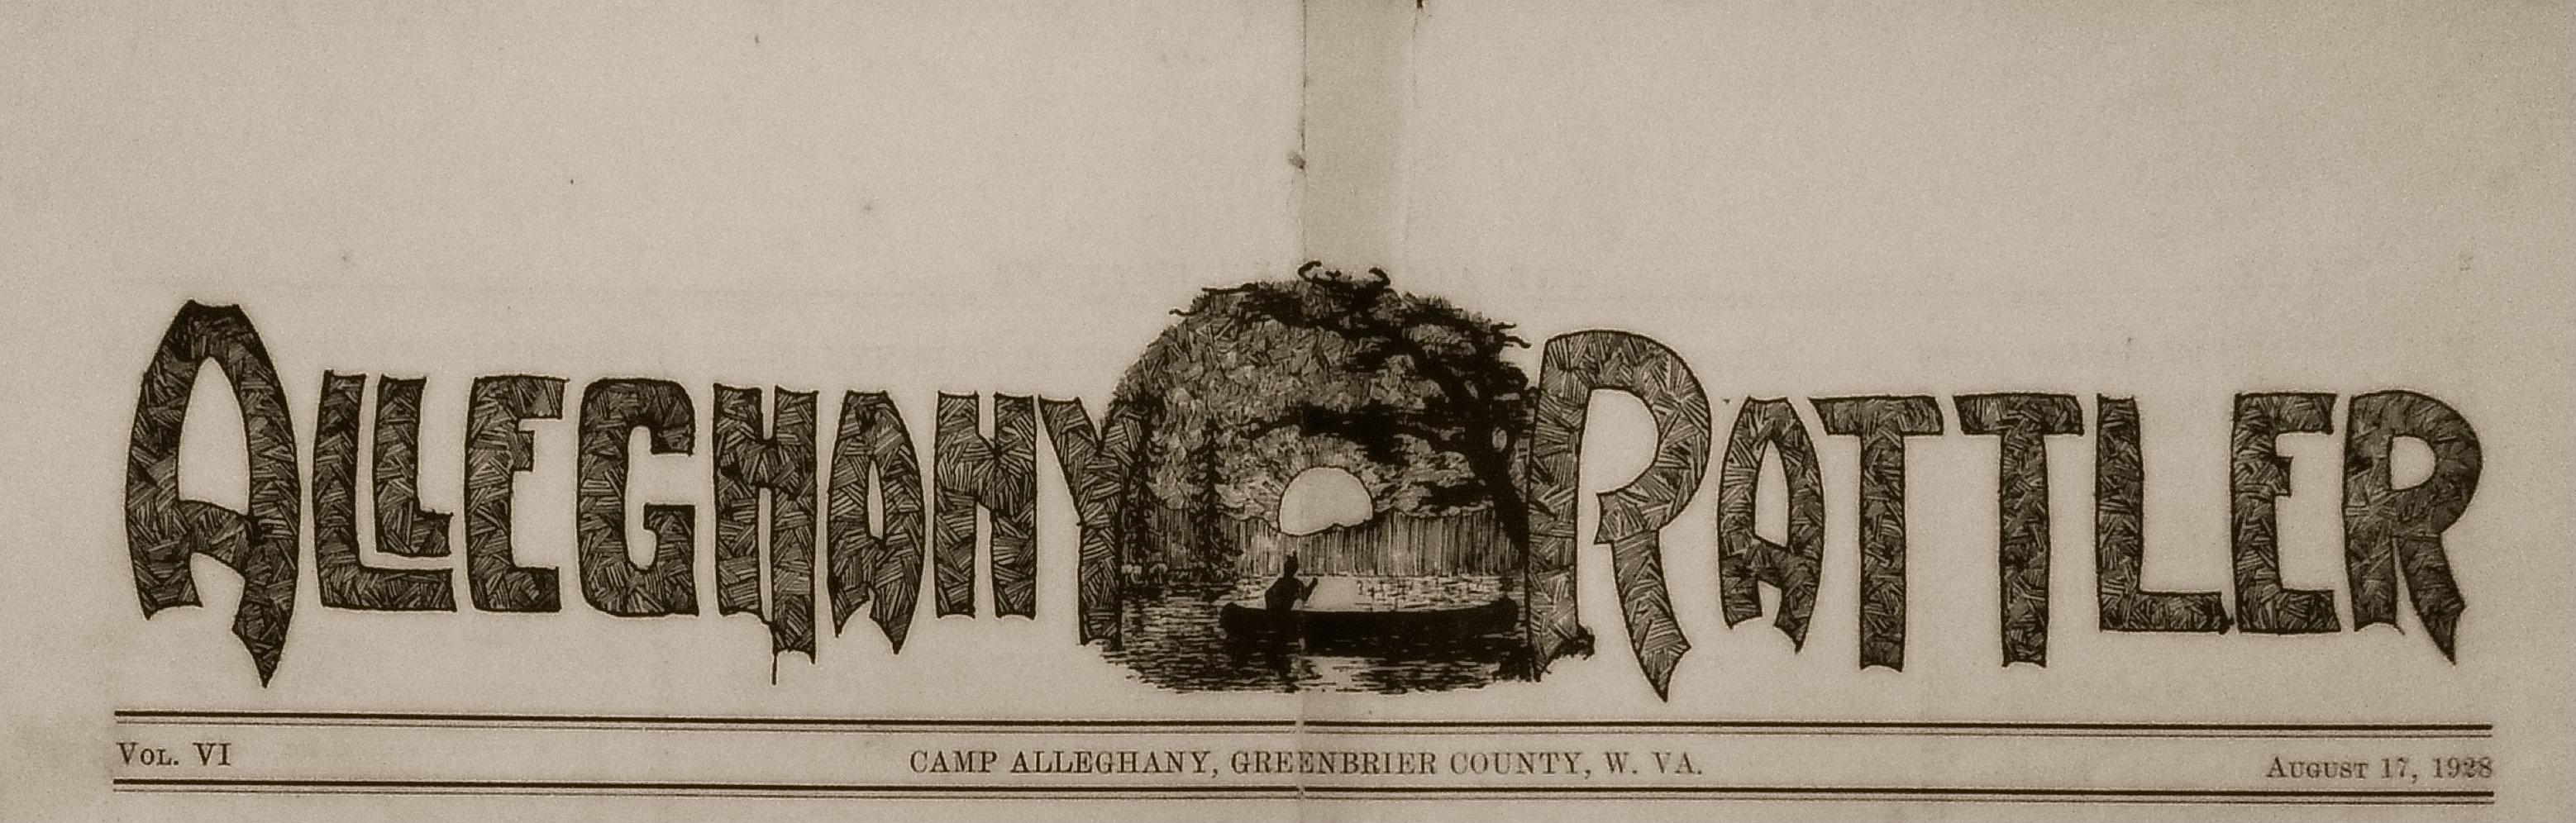 Camp newspaper